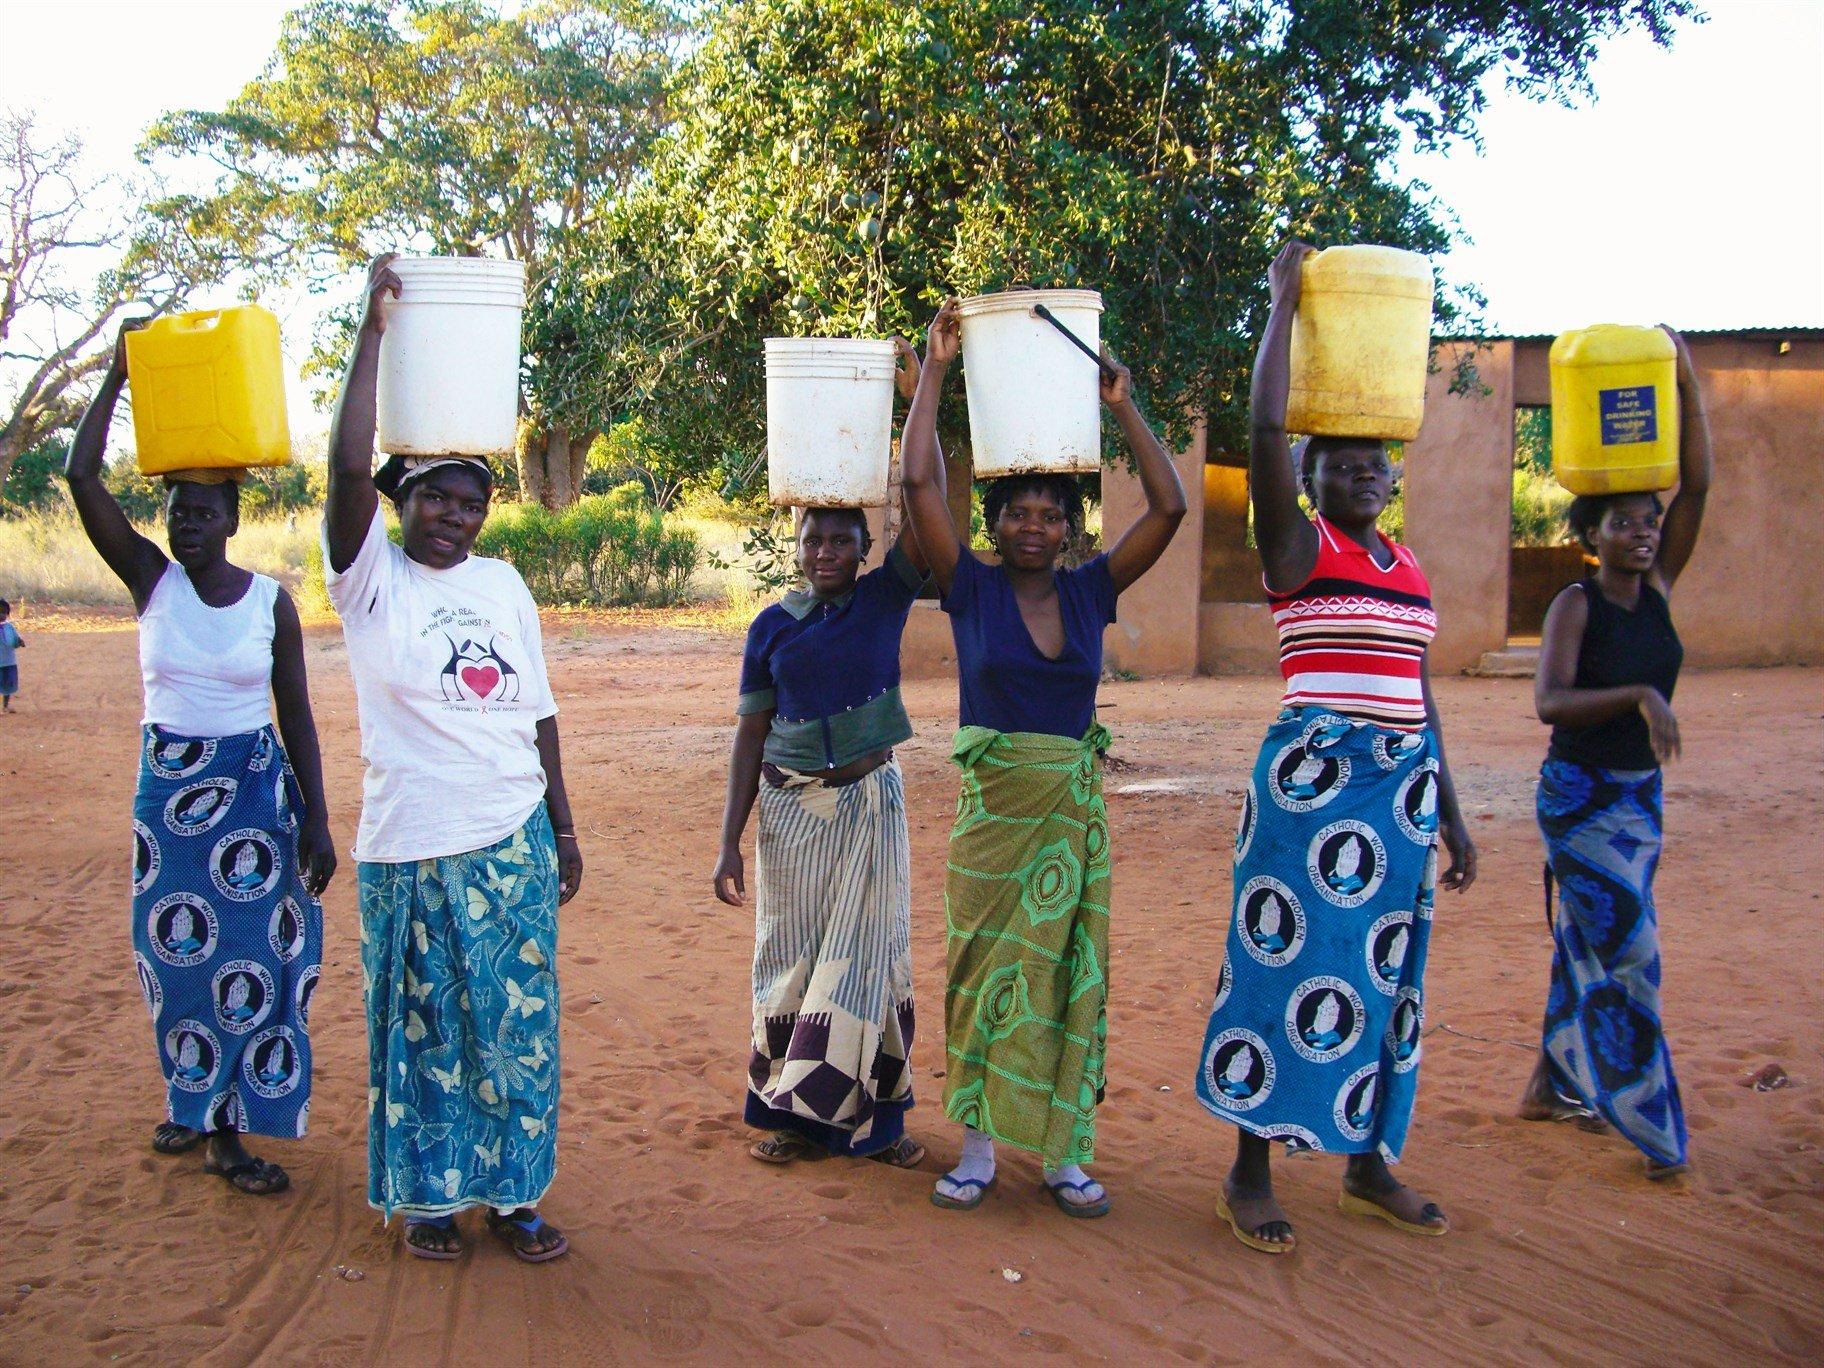 Women fetching water in Africa